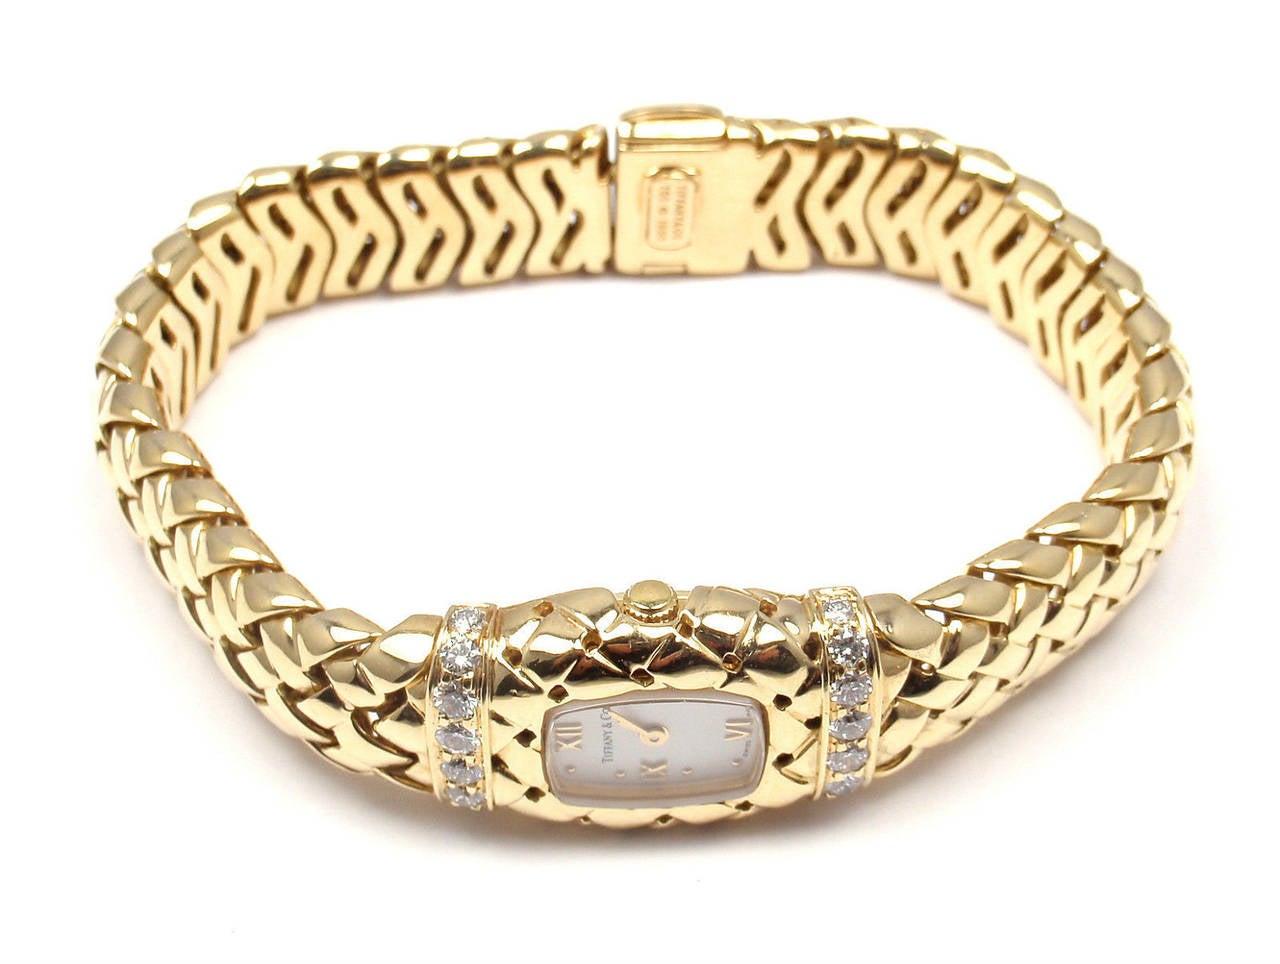 Tiffany & Co. Lady's Yellow Gold Diamond Basket Weave Quartz Wristwatch 2